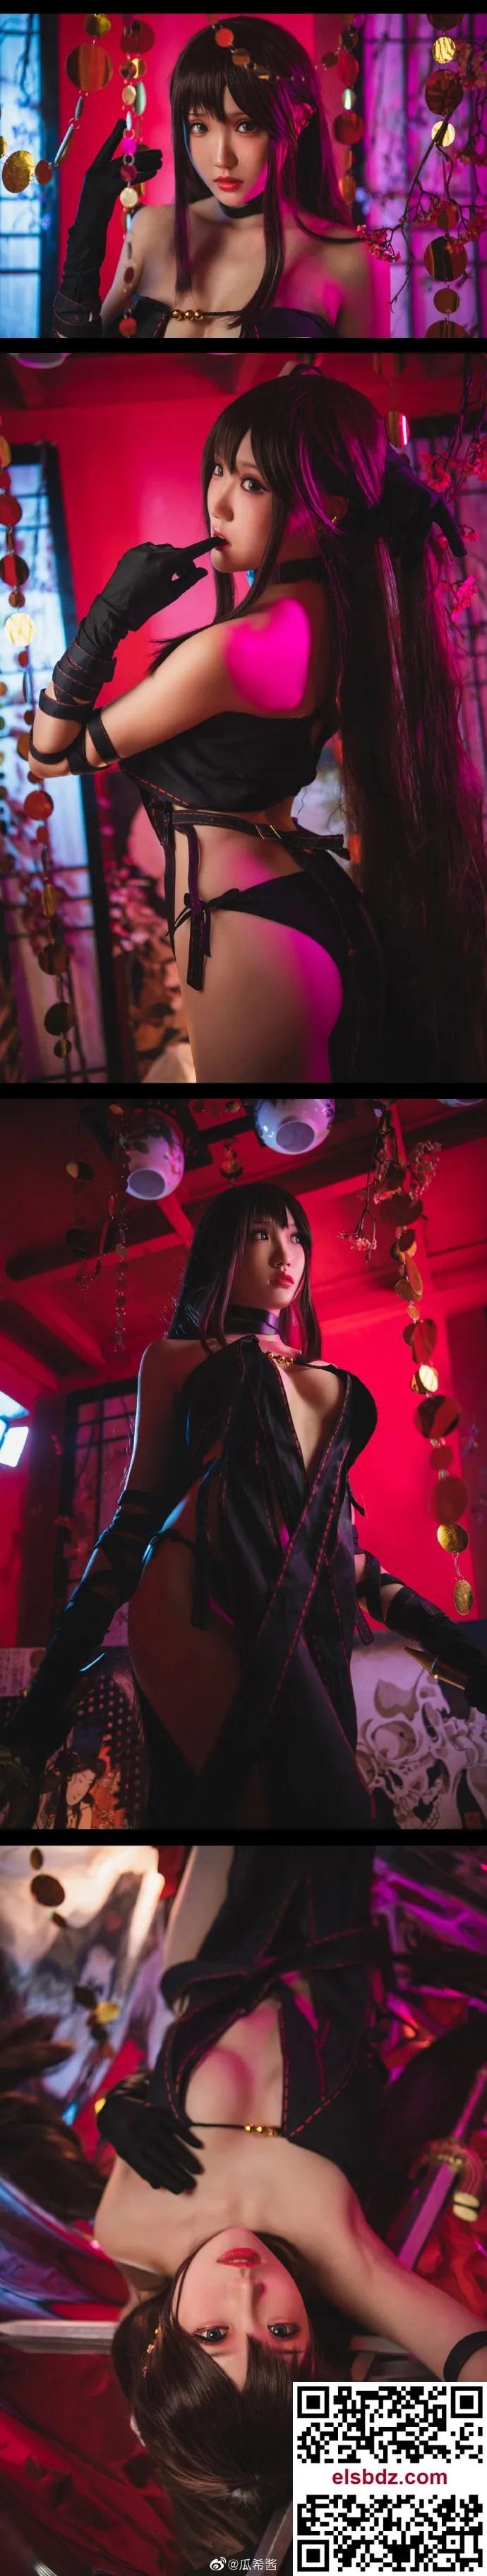 Fate/GrandOrder虞姬 命运冠位指定 虞美人cos CN瓜希酱 (9P)插图(8)